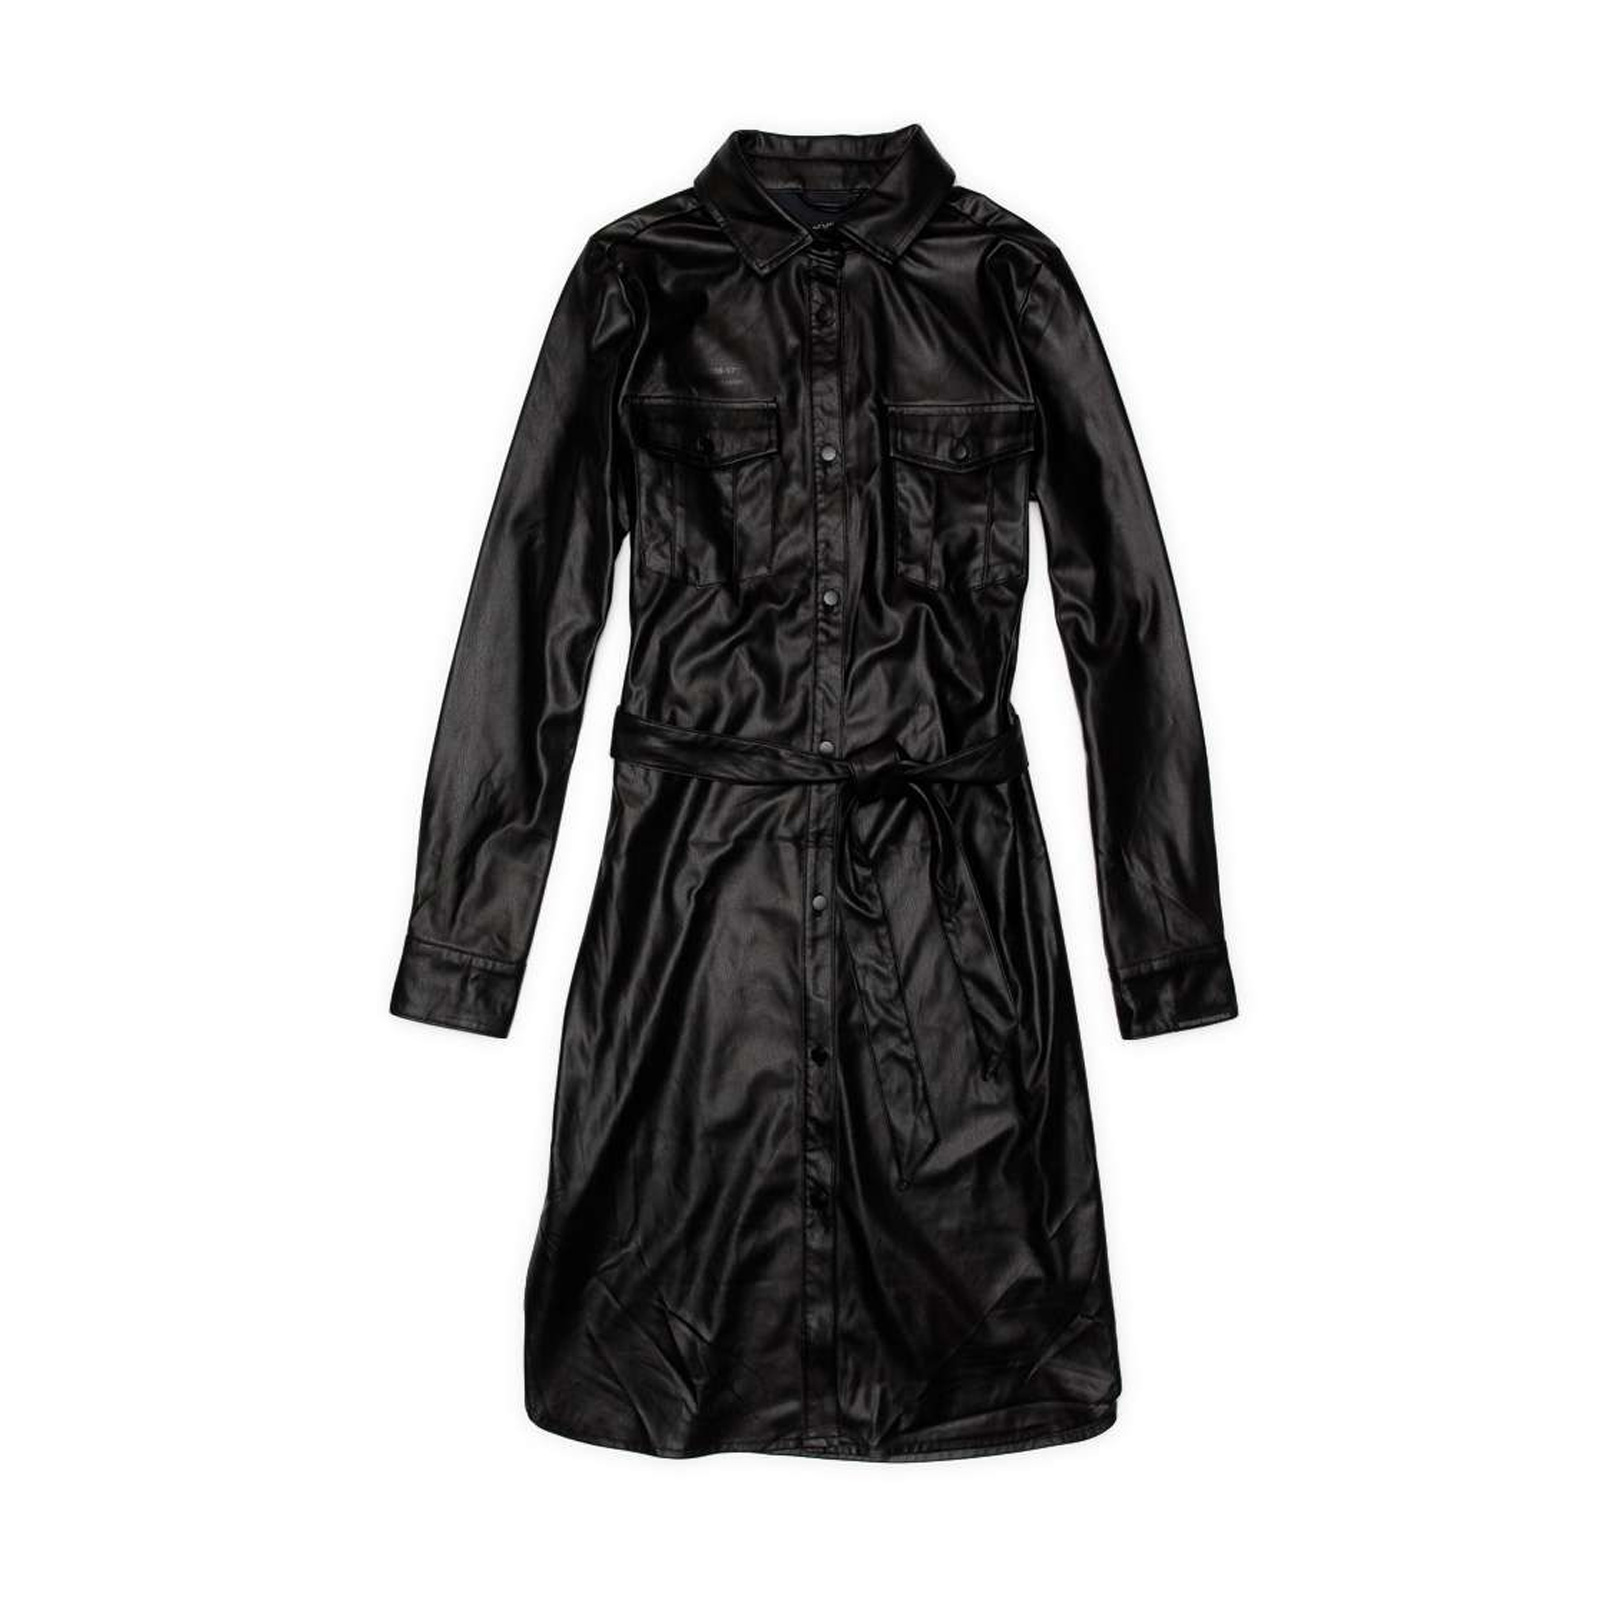 Devergo - WOMEN'S DRESS - 16